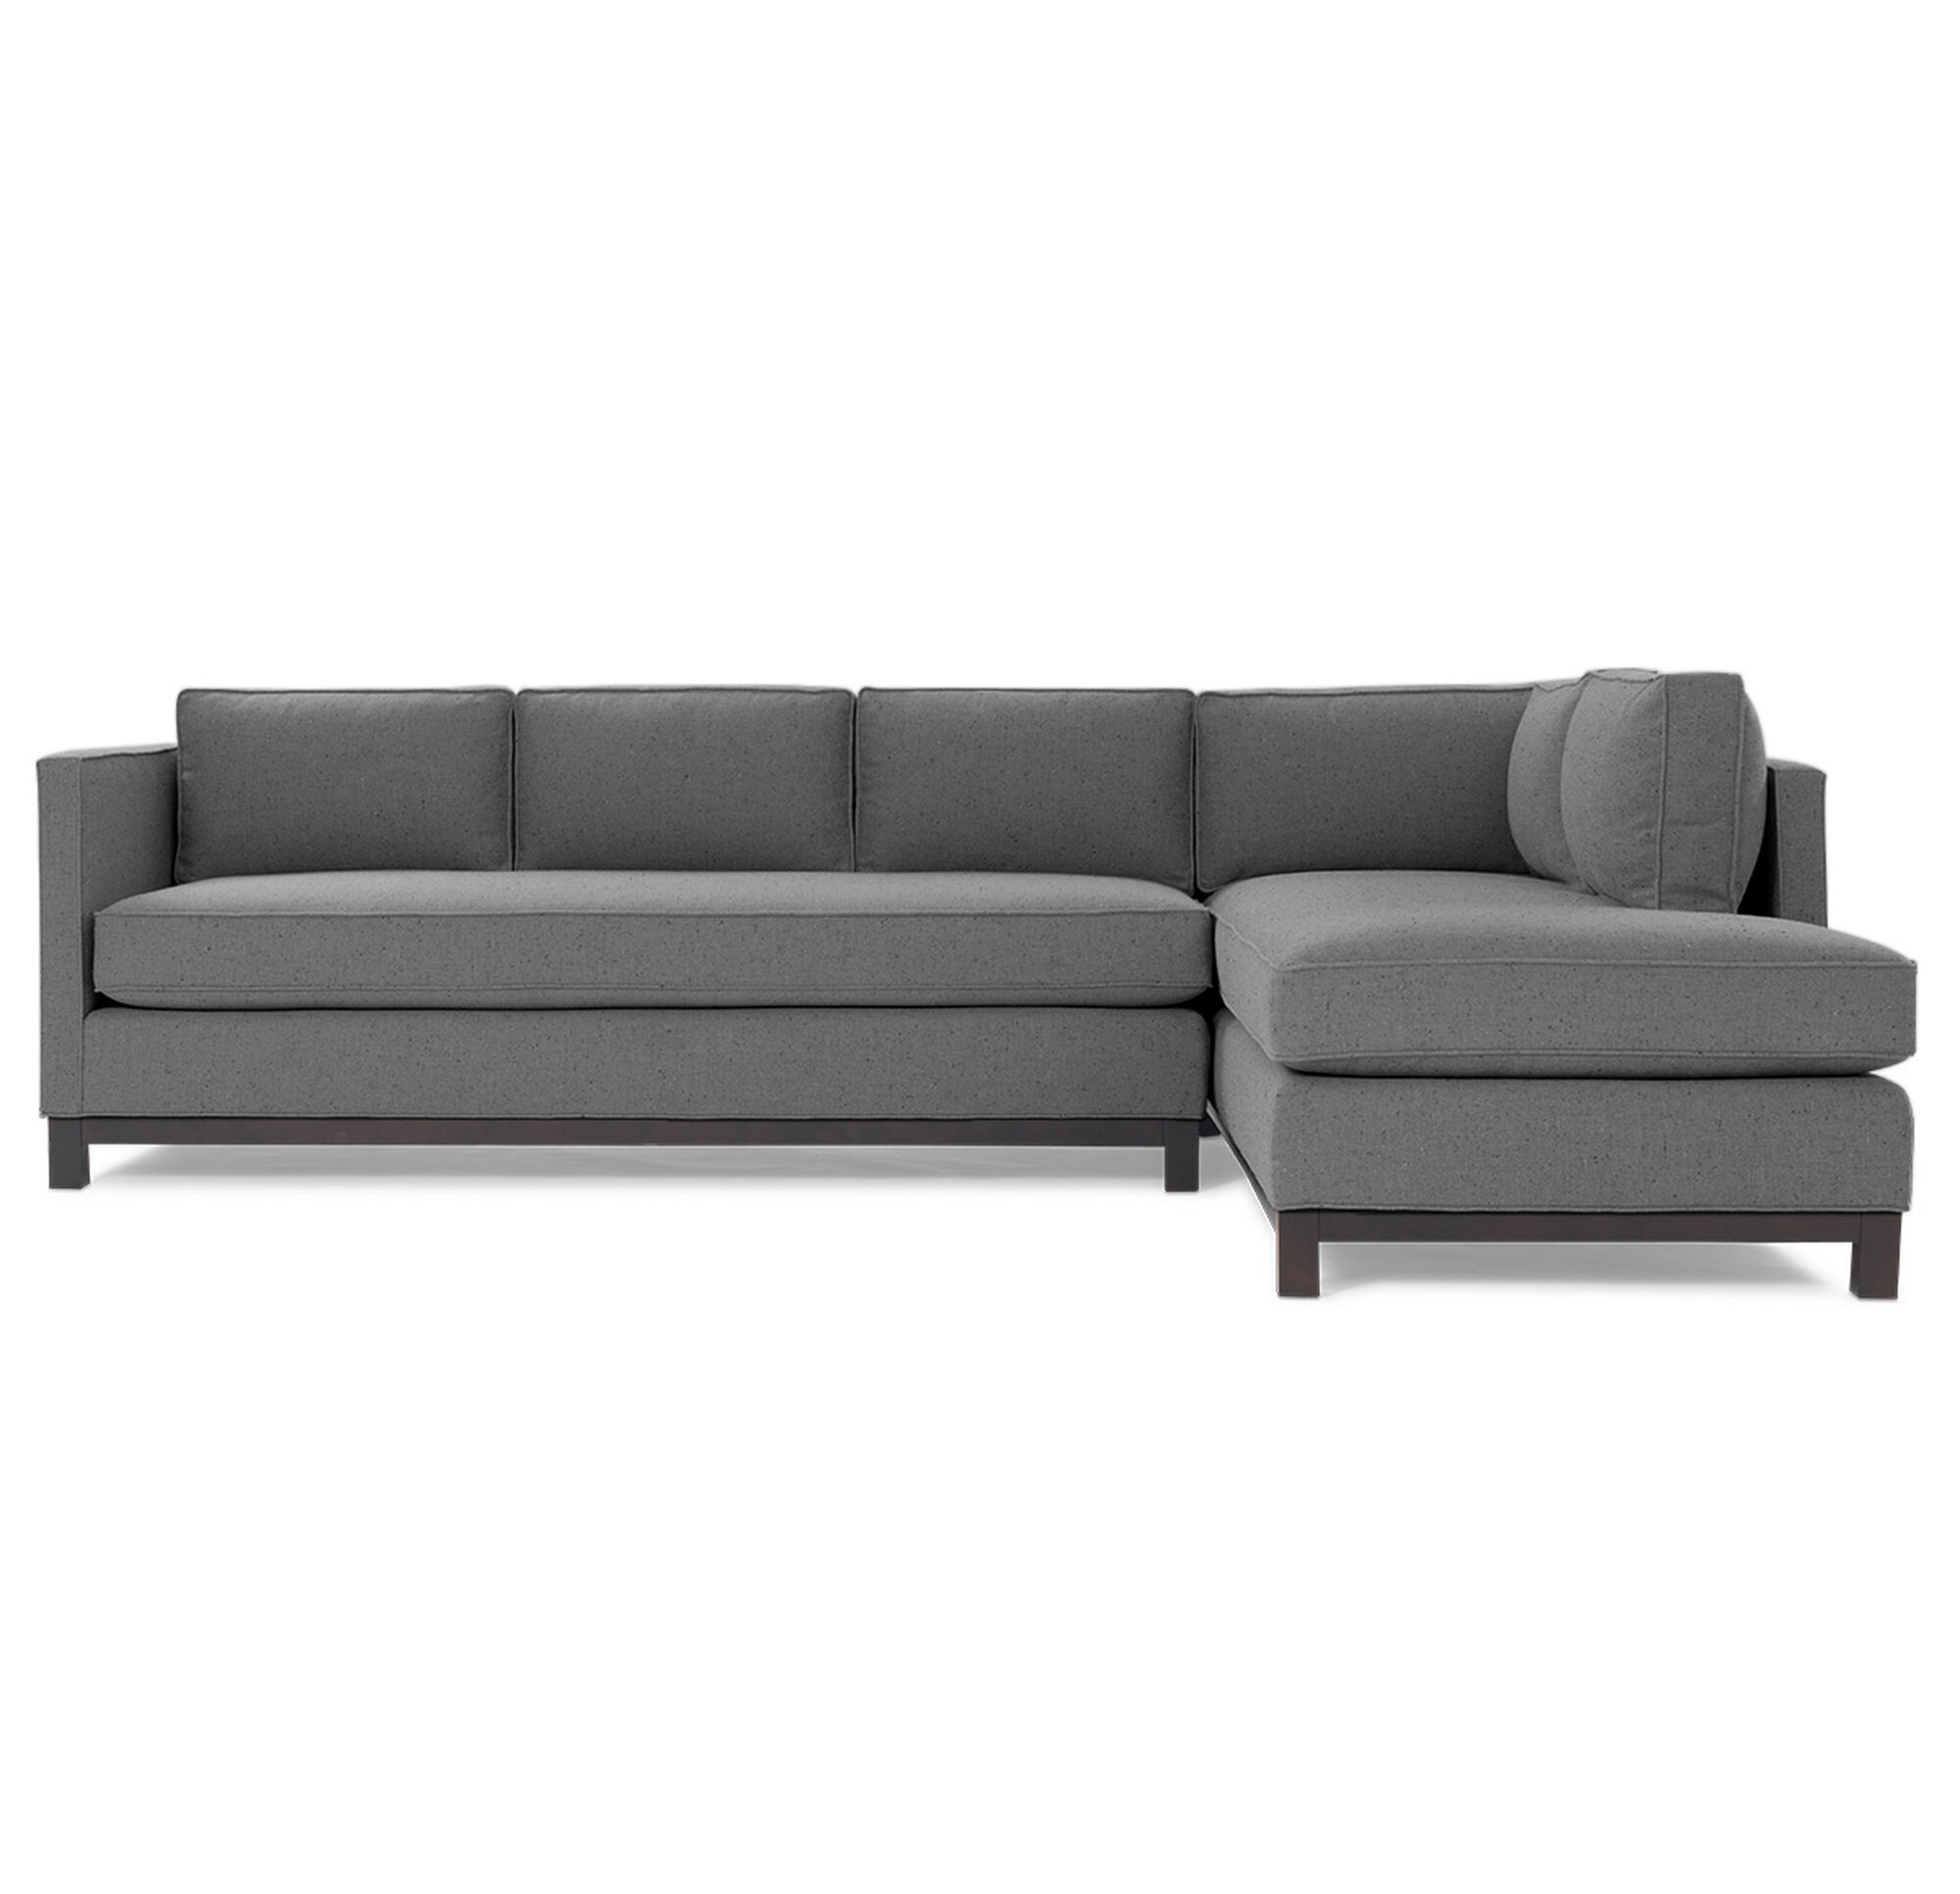 clifton sectional sofa. Black Bedroom Furniture Sets. Home Design Ideas